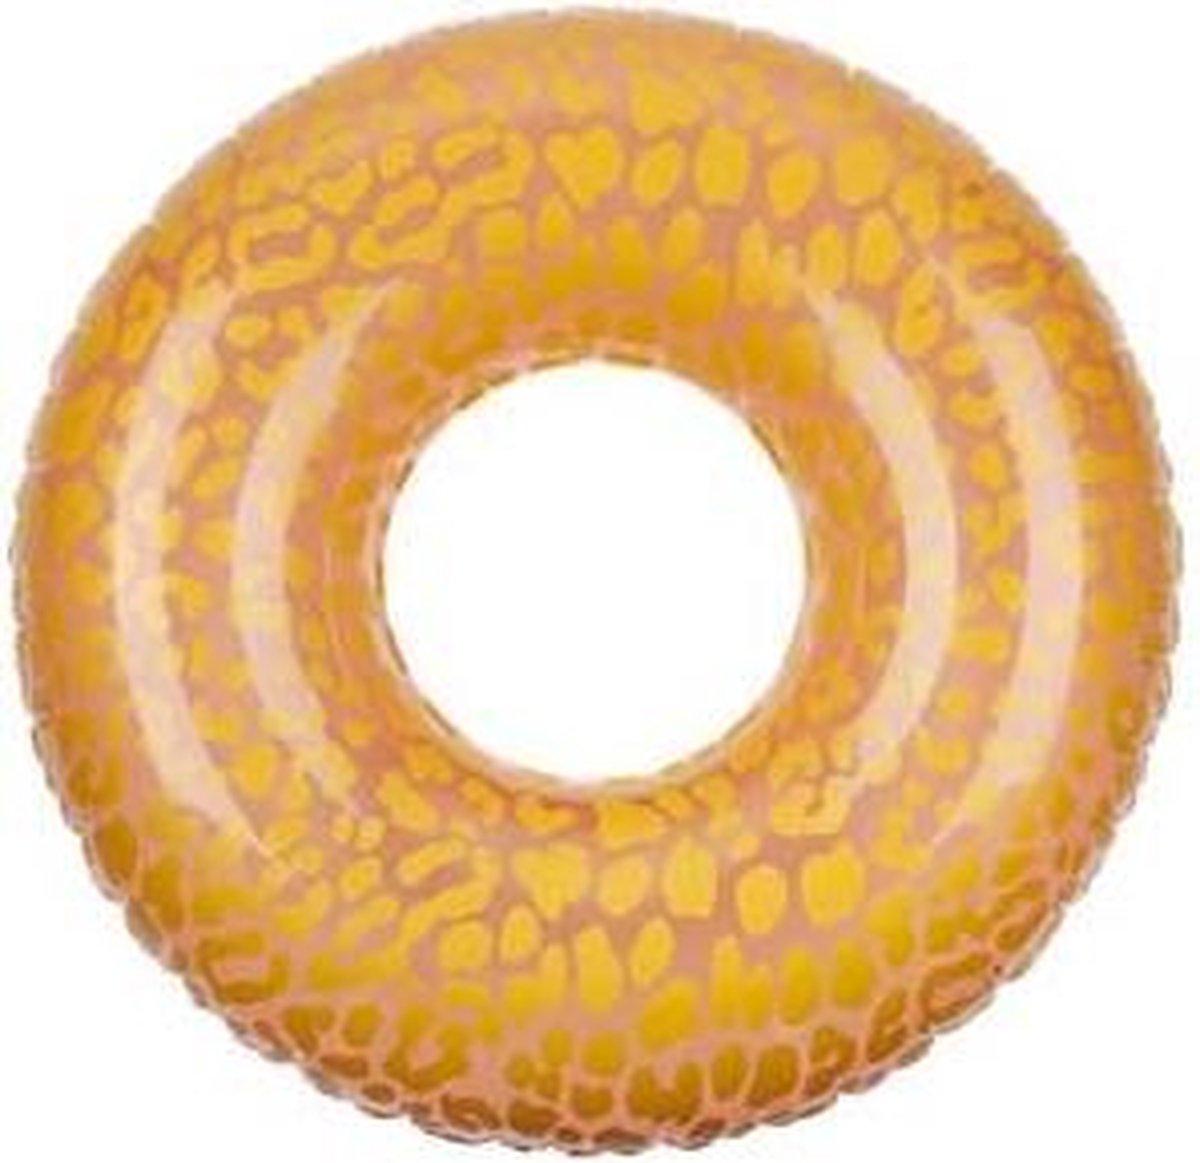 Sunnylife - Zwemband Panter - opblaasbaar - 110 x 110 x 35cm - max 100kg. - Goud